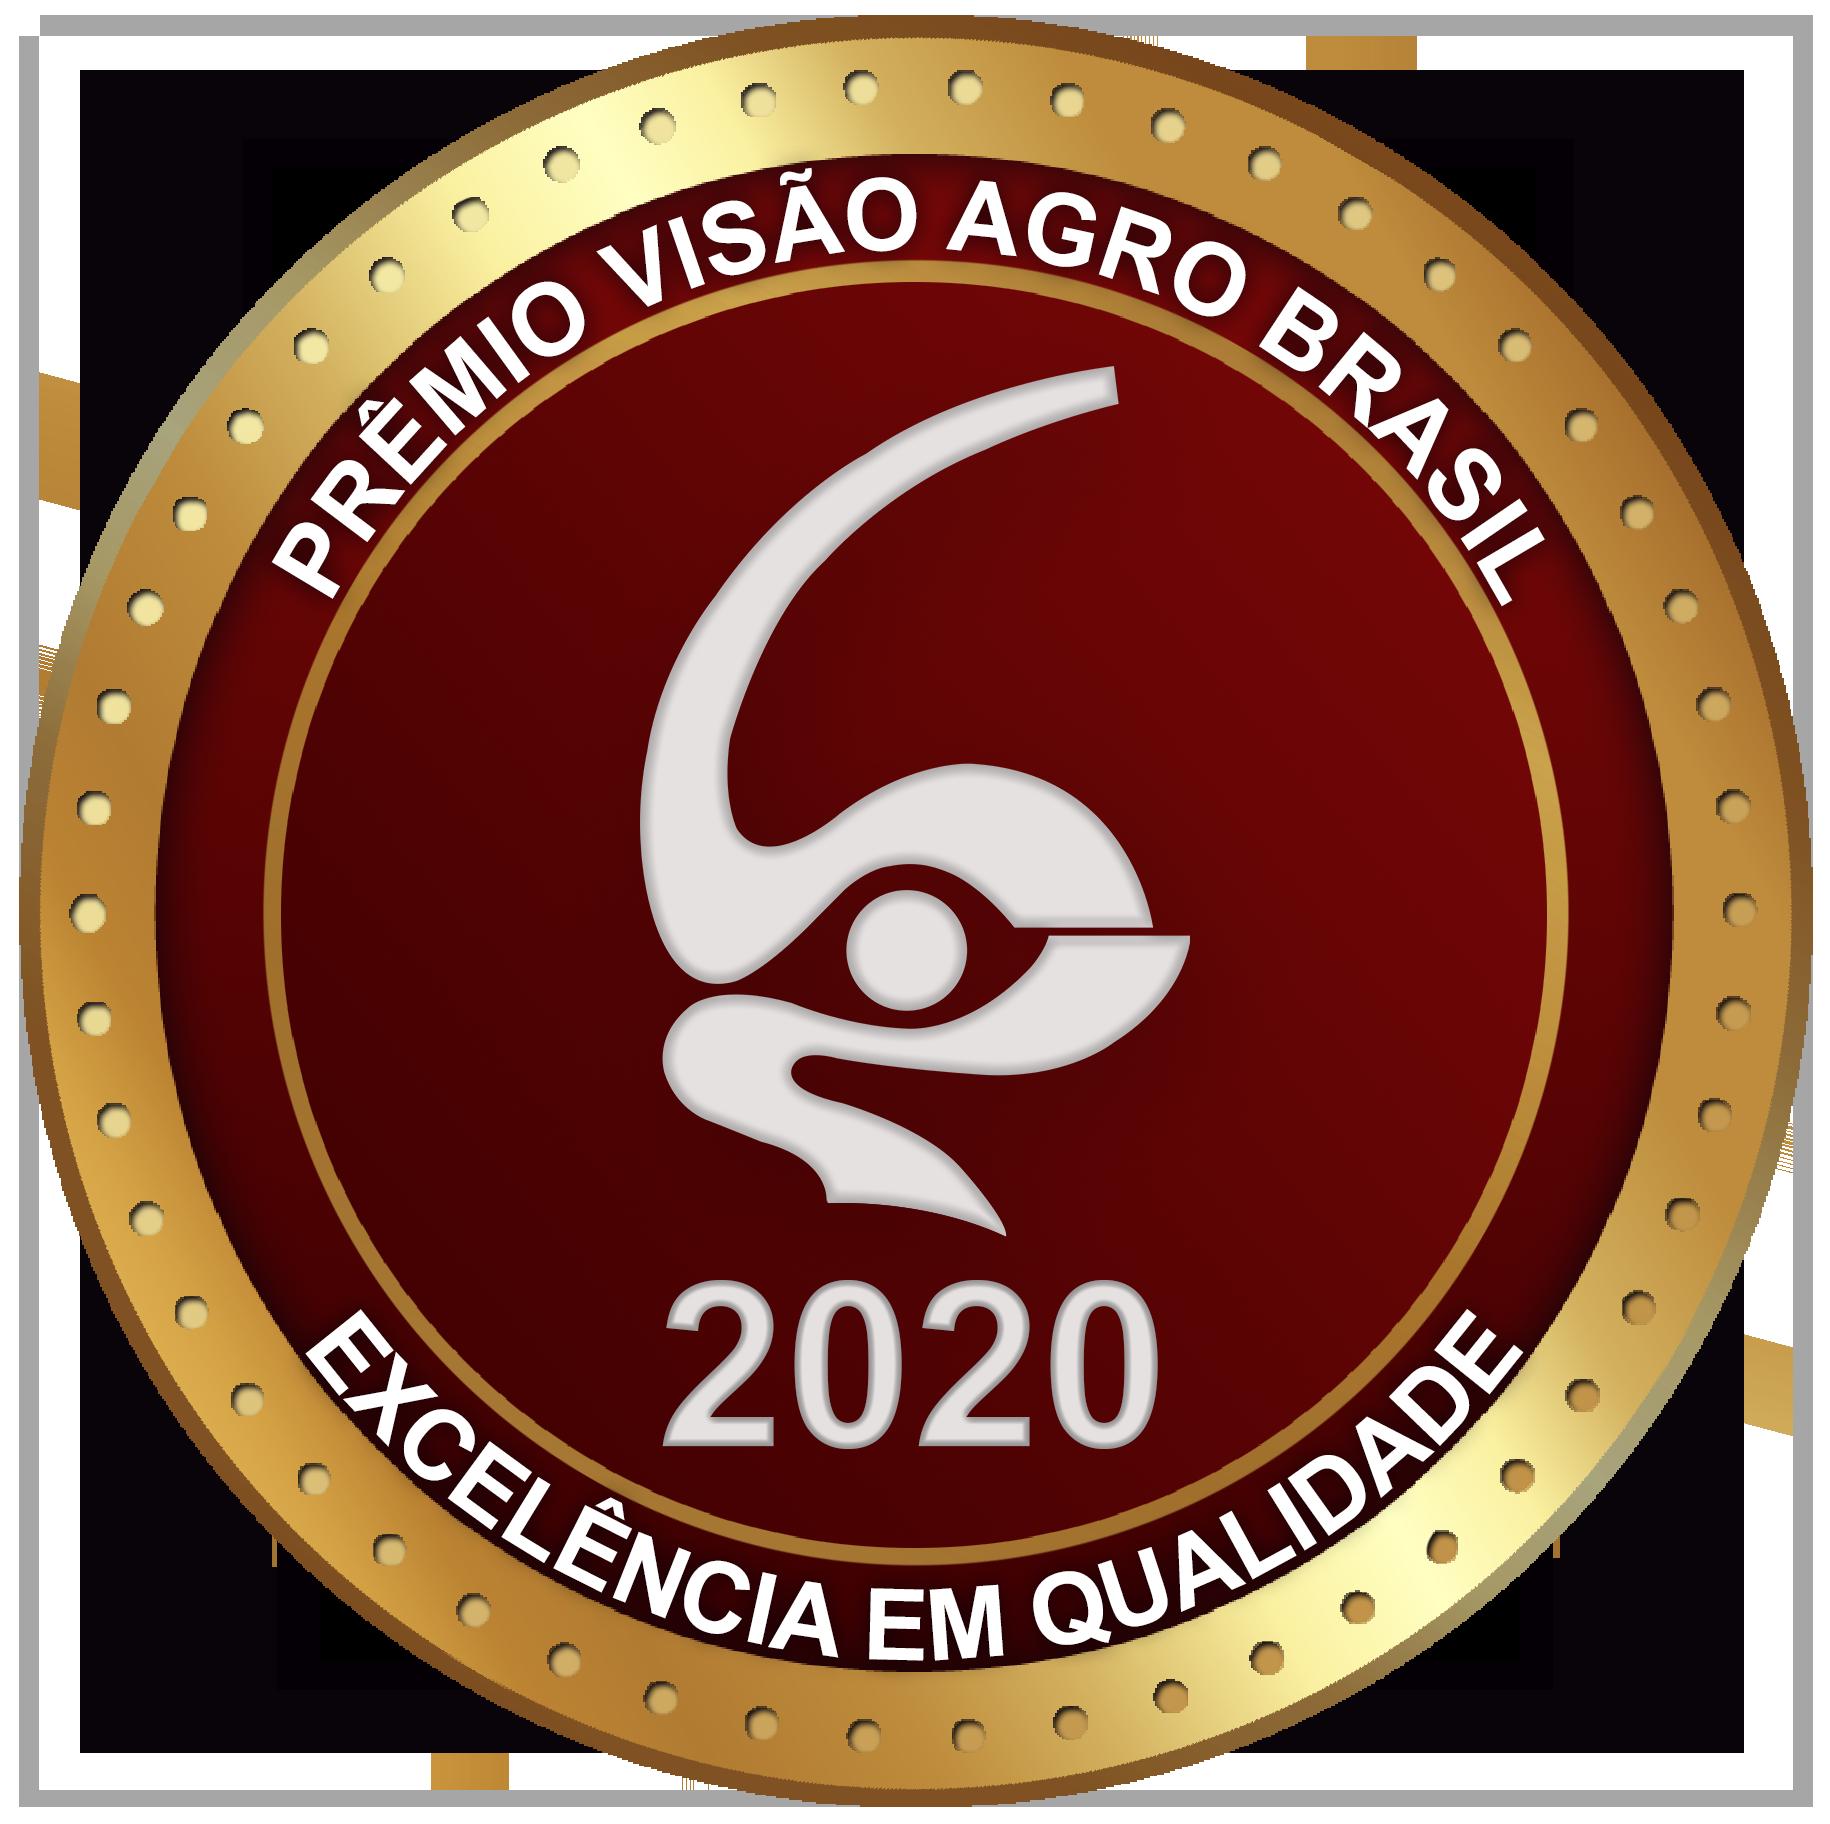 Visão Agro 2020